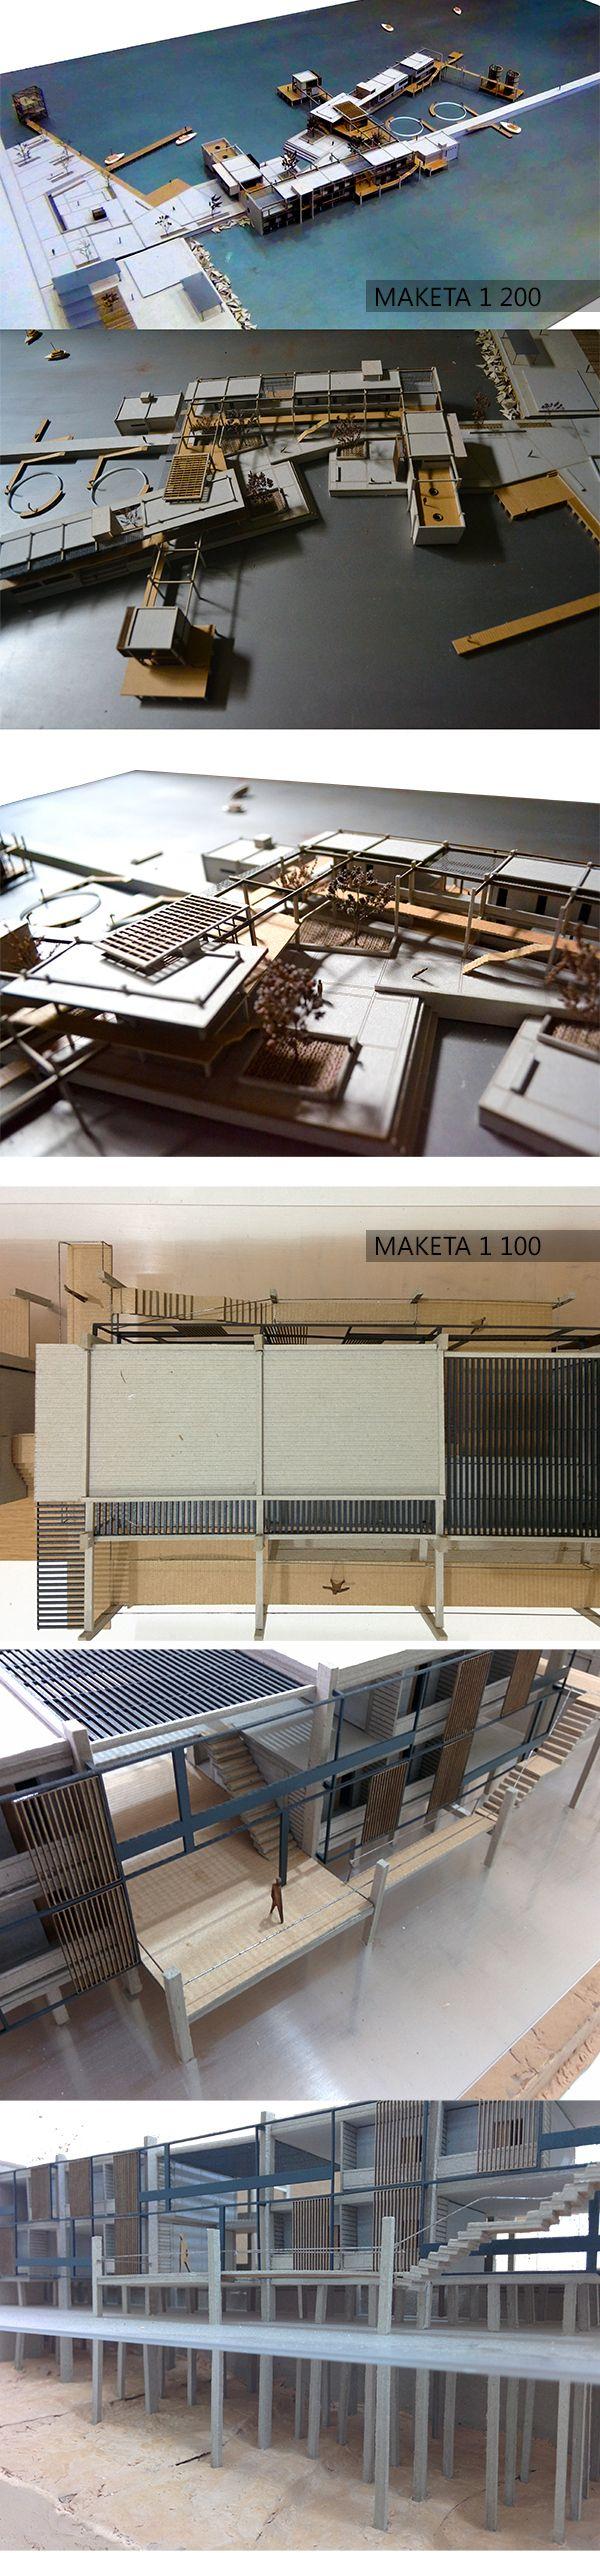 Articles - ΔΙΠΛΩΜΑΤΙΚΕΣ - ΕΡΓΑΣΙΕΣ - Συμμετοχες 2014 - 142.14 Κέντρο Καταδύσεων στην Καβάλα